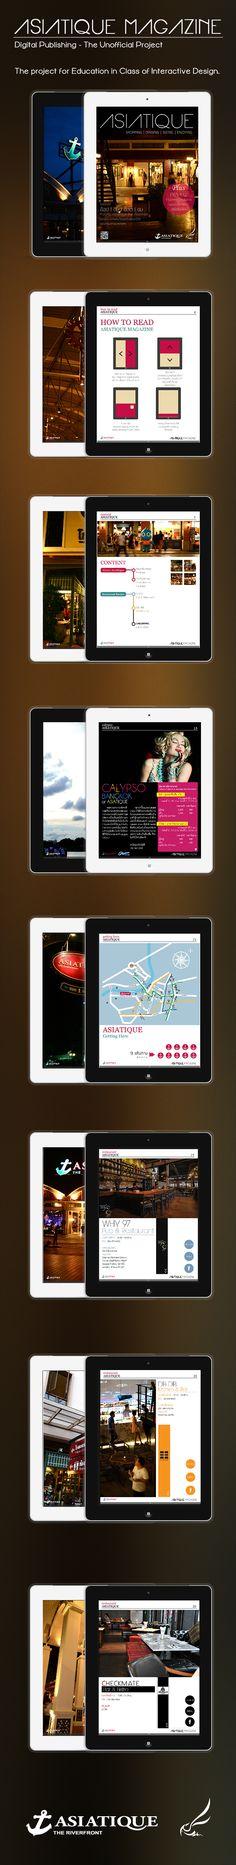 Asiatique Magazine (Unofficial Digital Publishing) on Behance